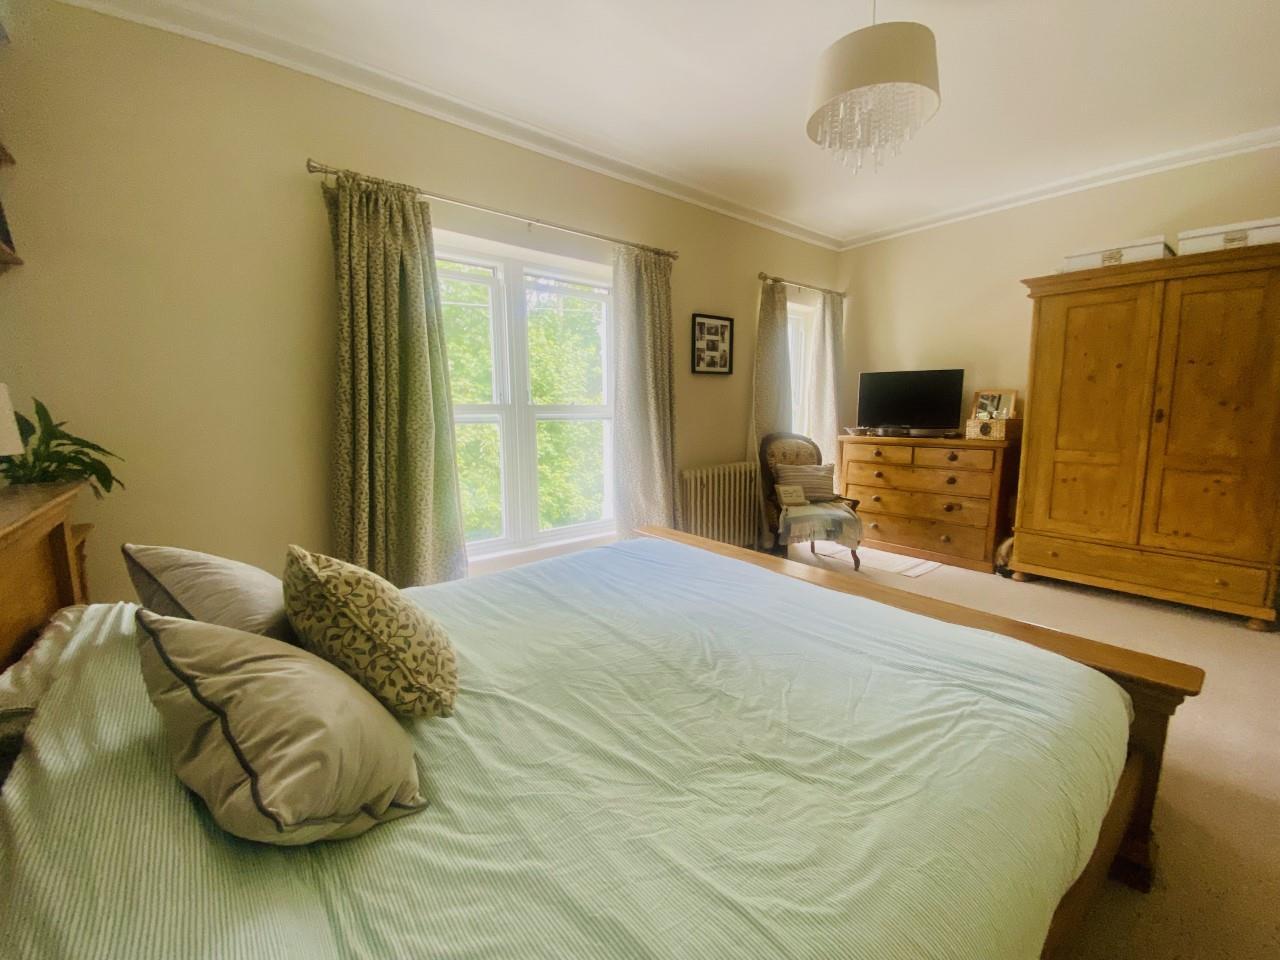 Woodlands, Gowerton, Swansea, SA4 3DP